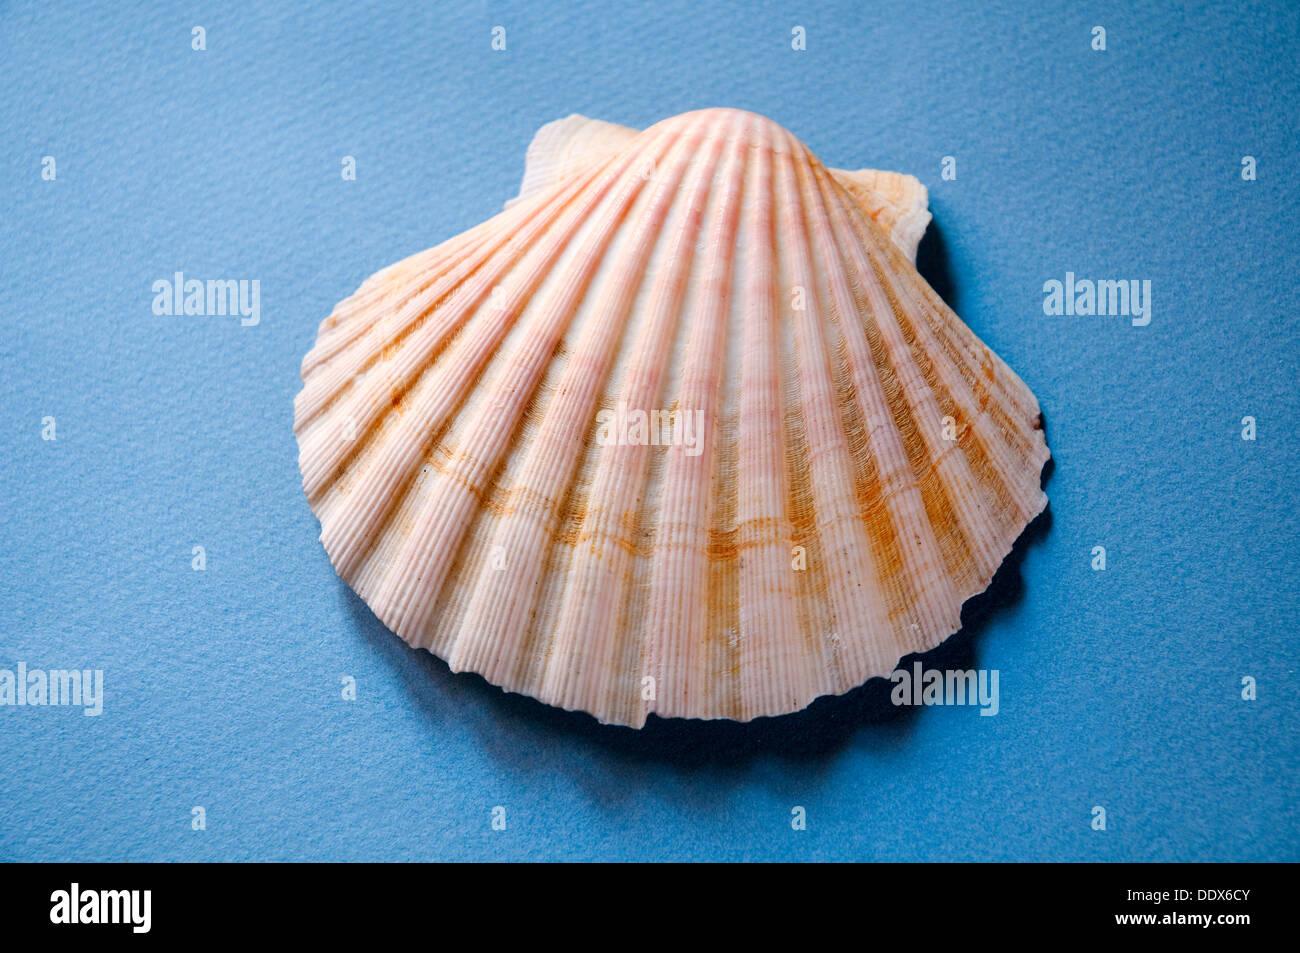 Shell - Stock Image